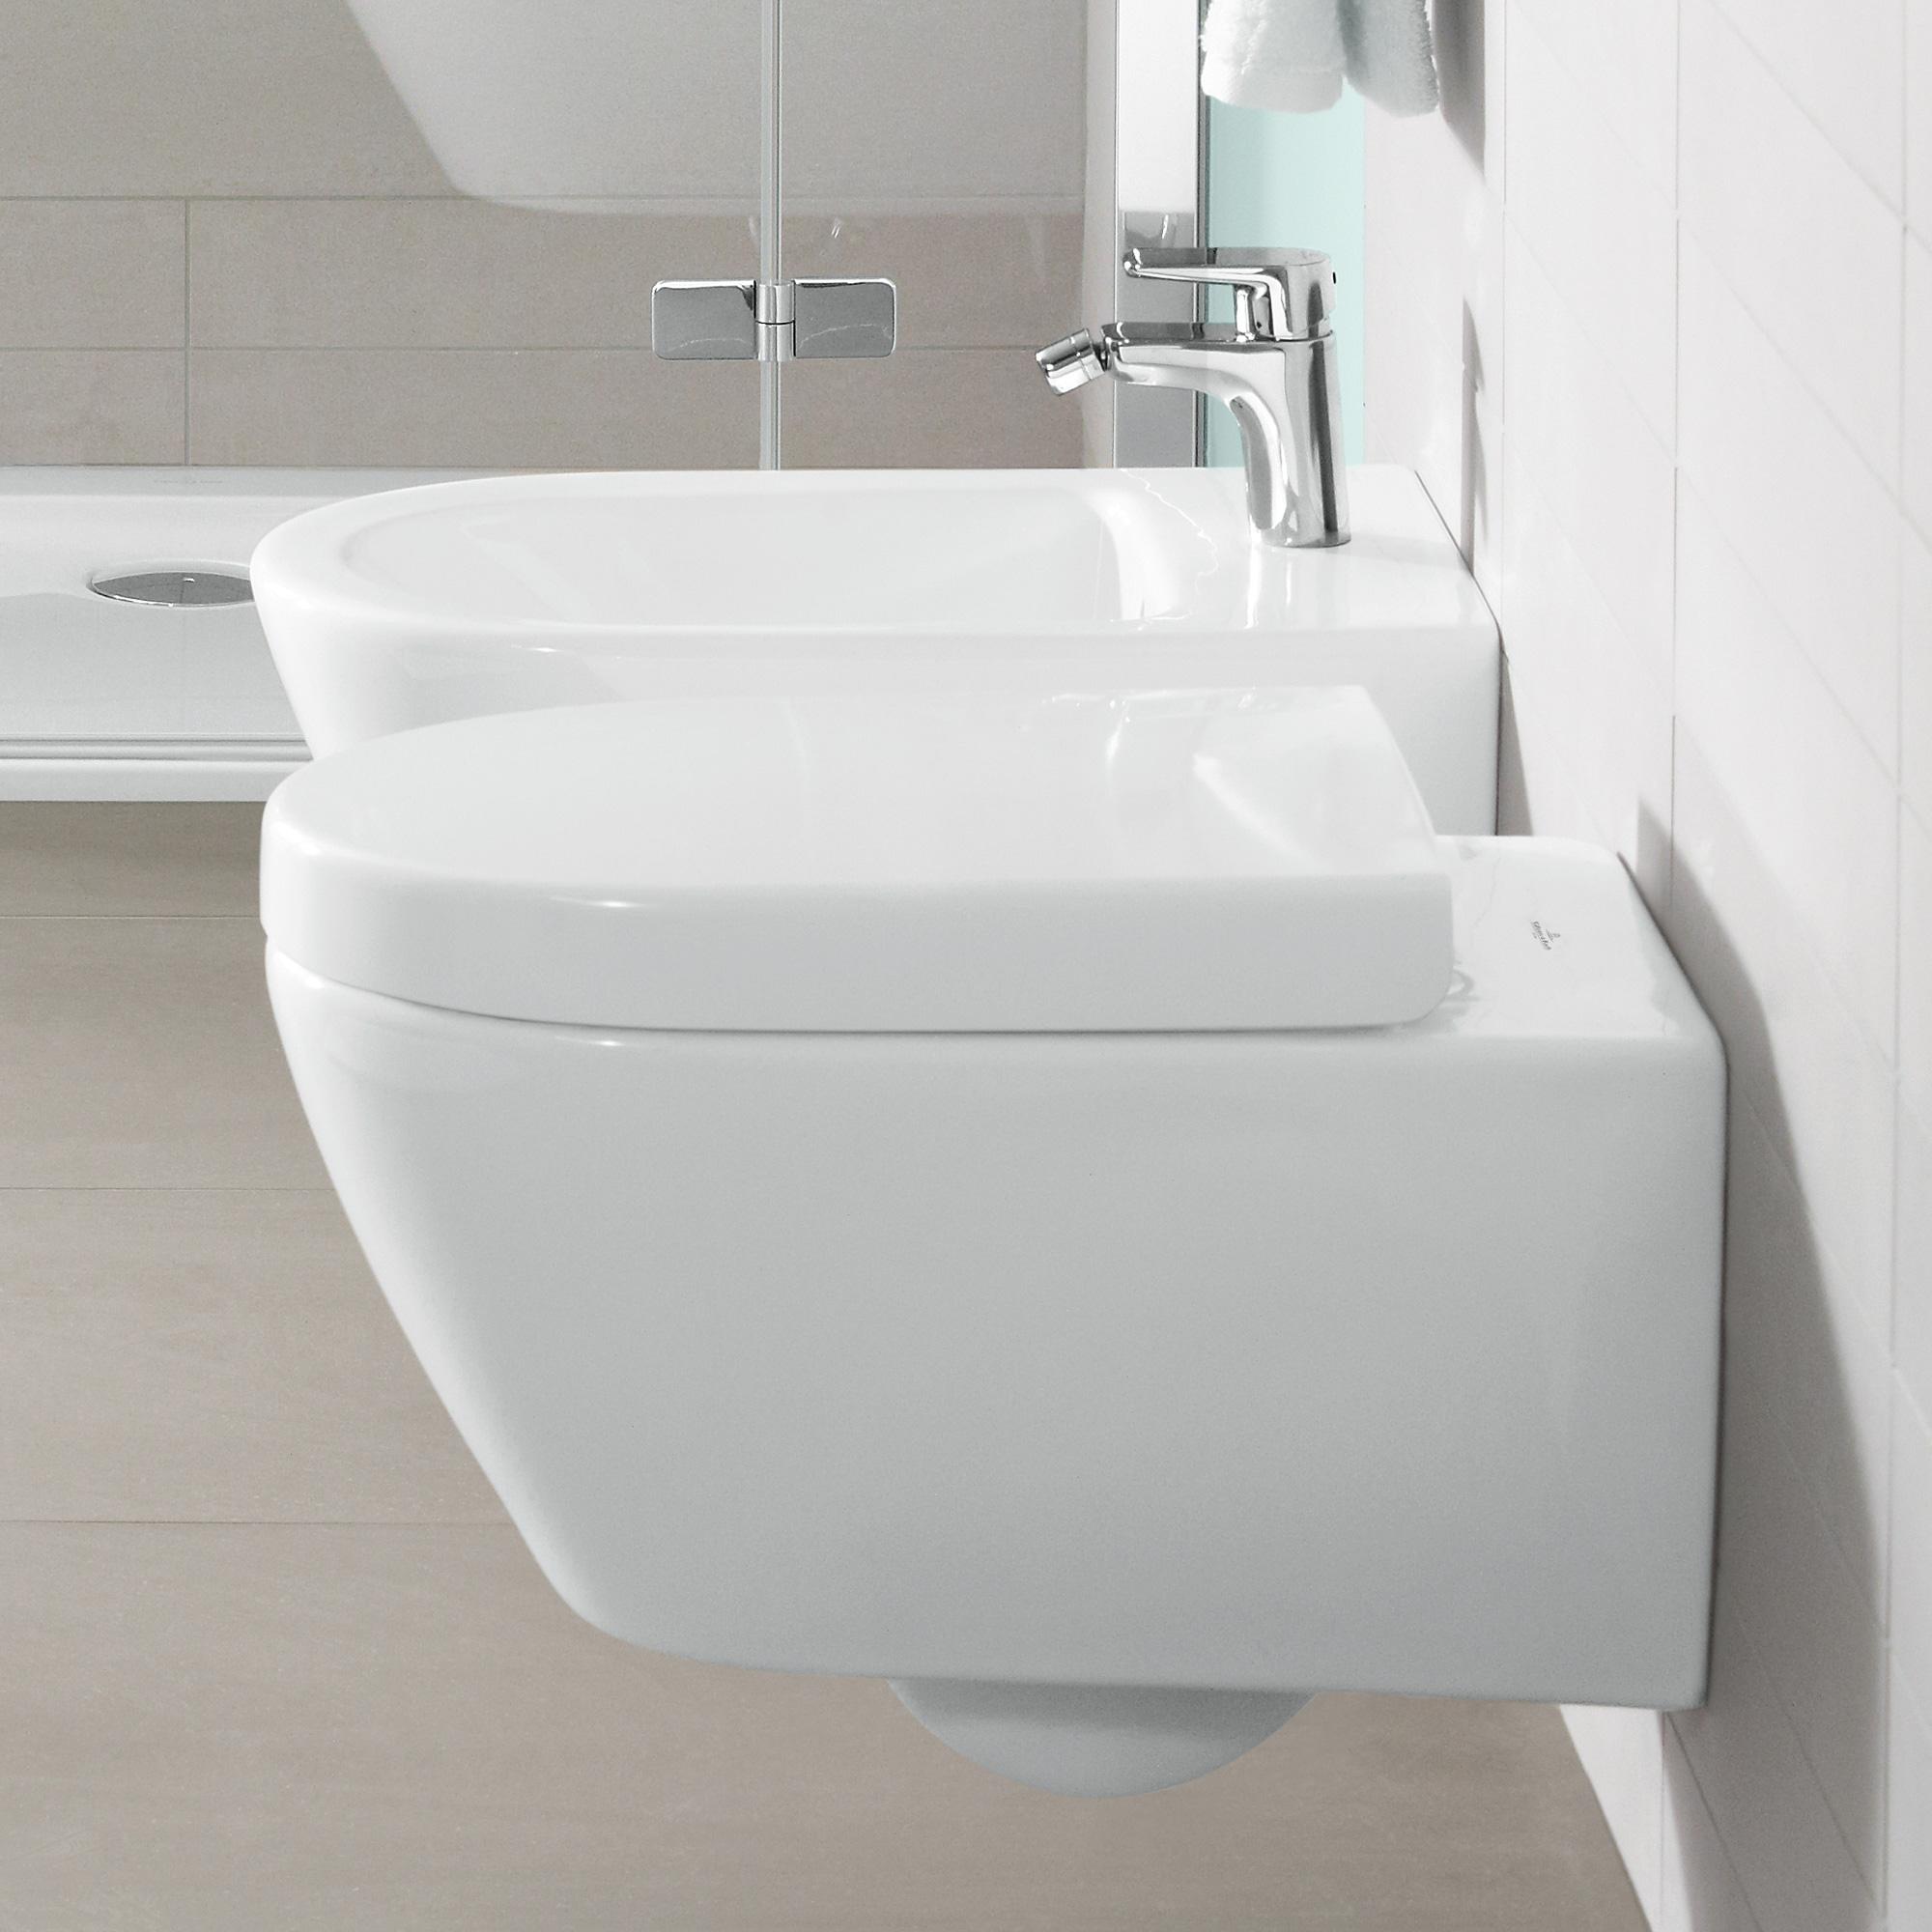 villeroy boch subway 2 0 tiefsp l wand wc l 56 b 37 cm wei mit ceramicplus 560010r1. Black Bedroom Furniture Sets. Home Design Ideas